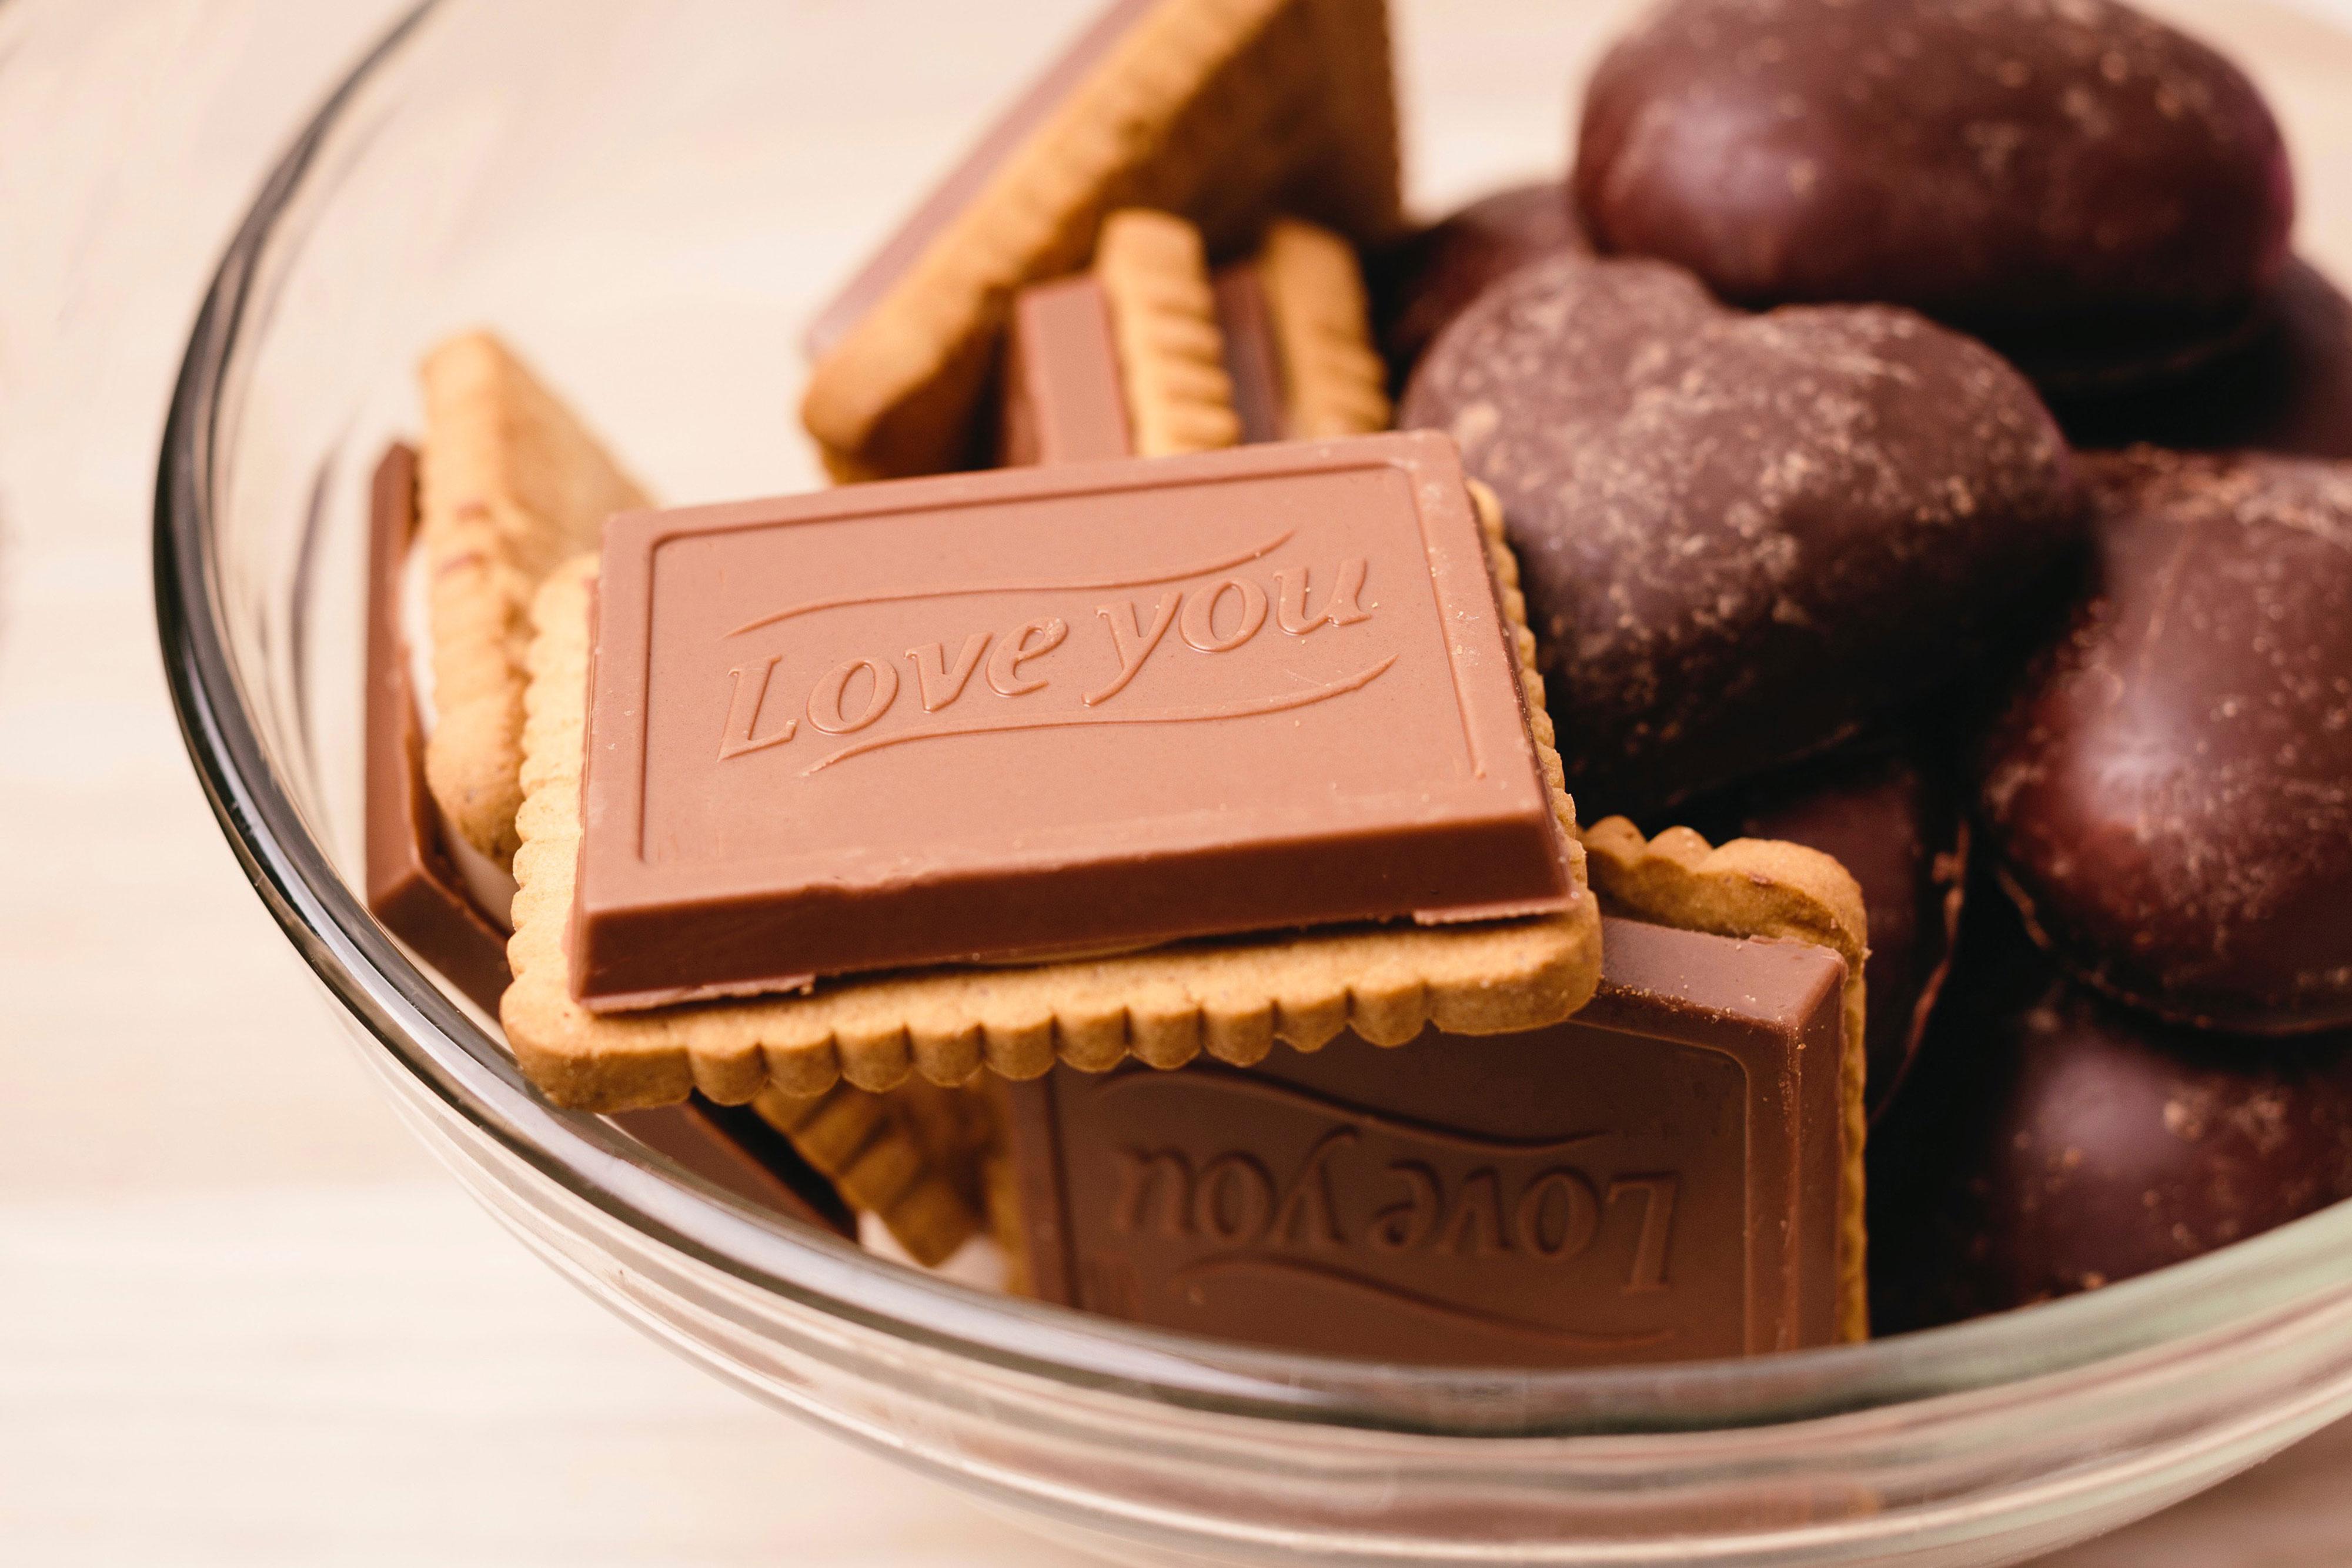 loveyouチョコレート